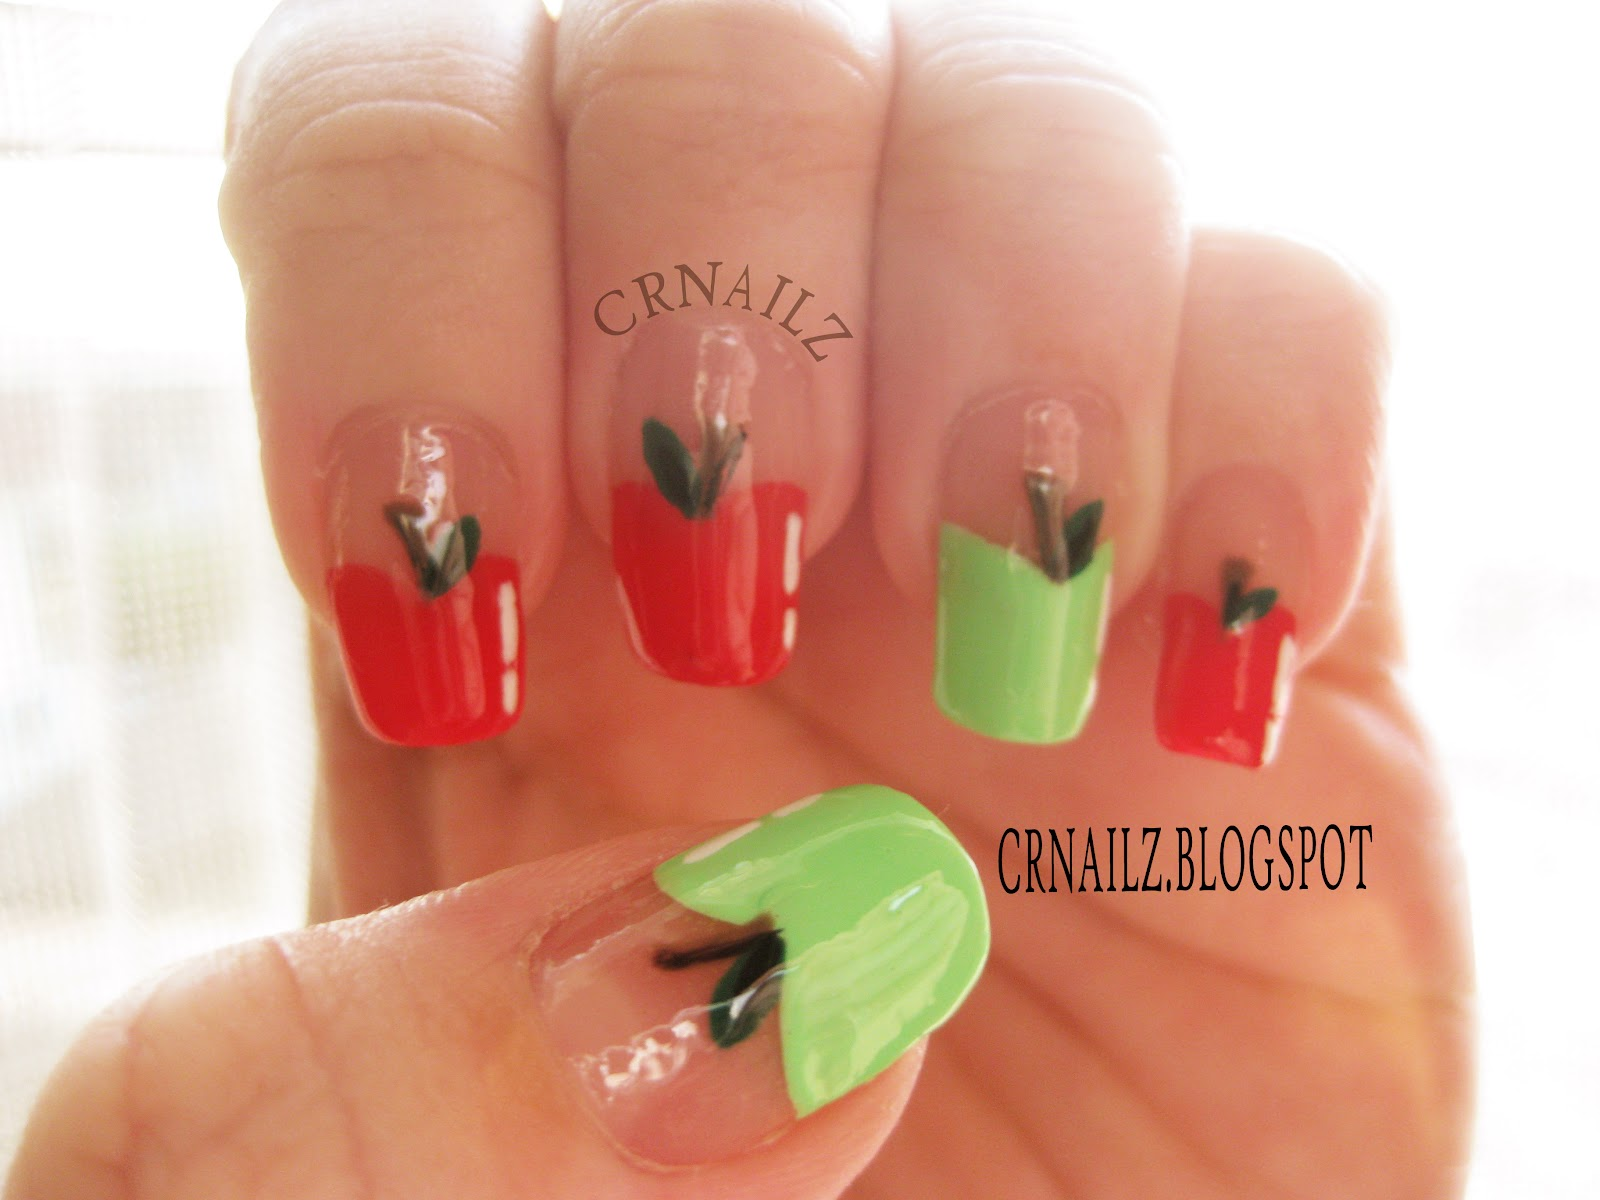 Crnailz French Apples